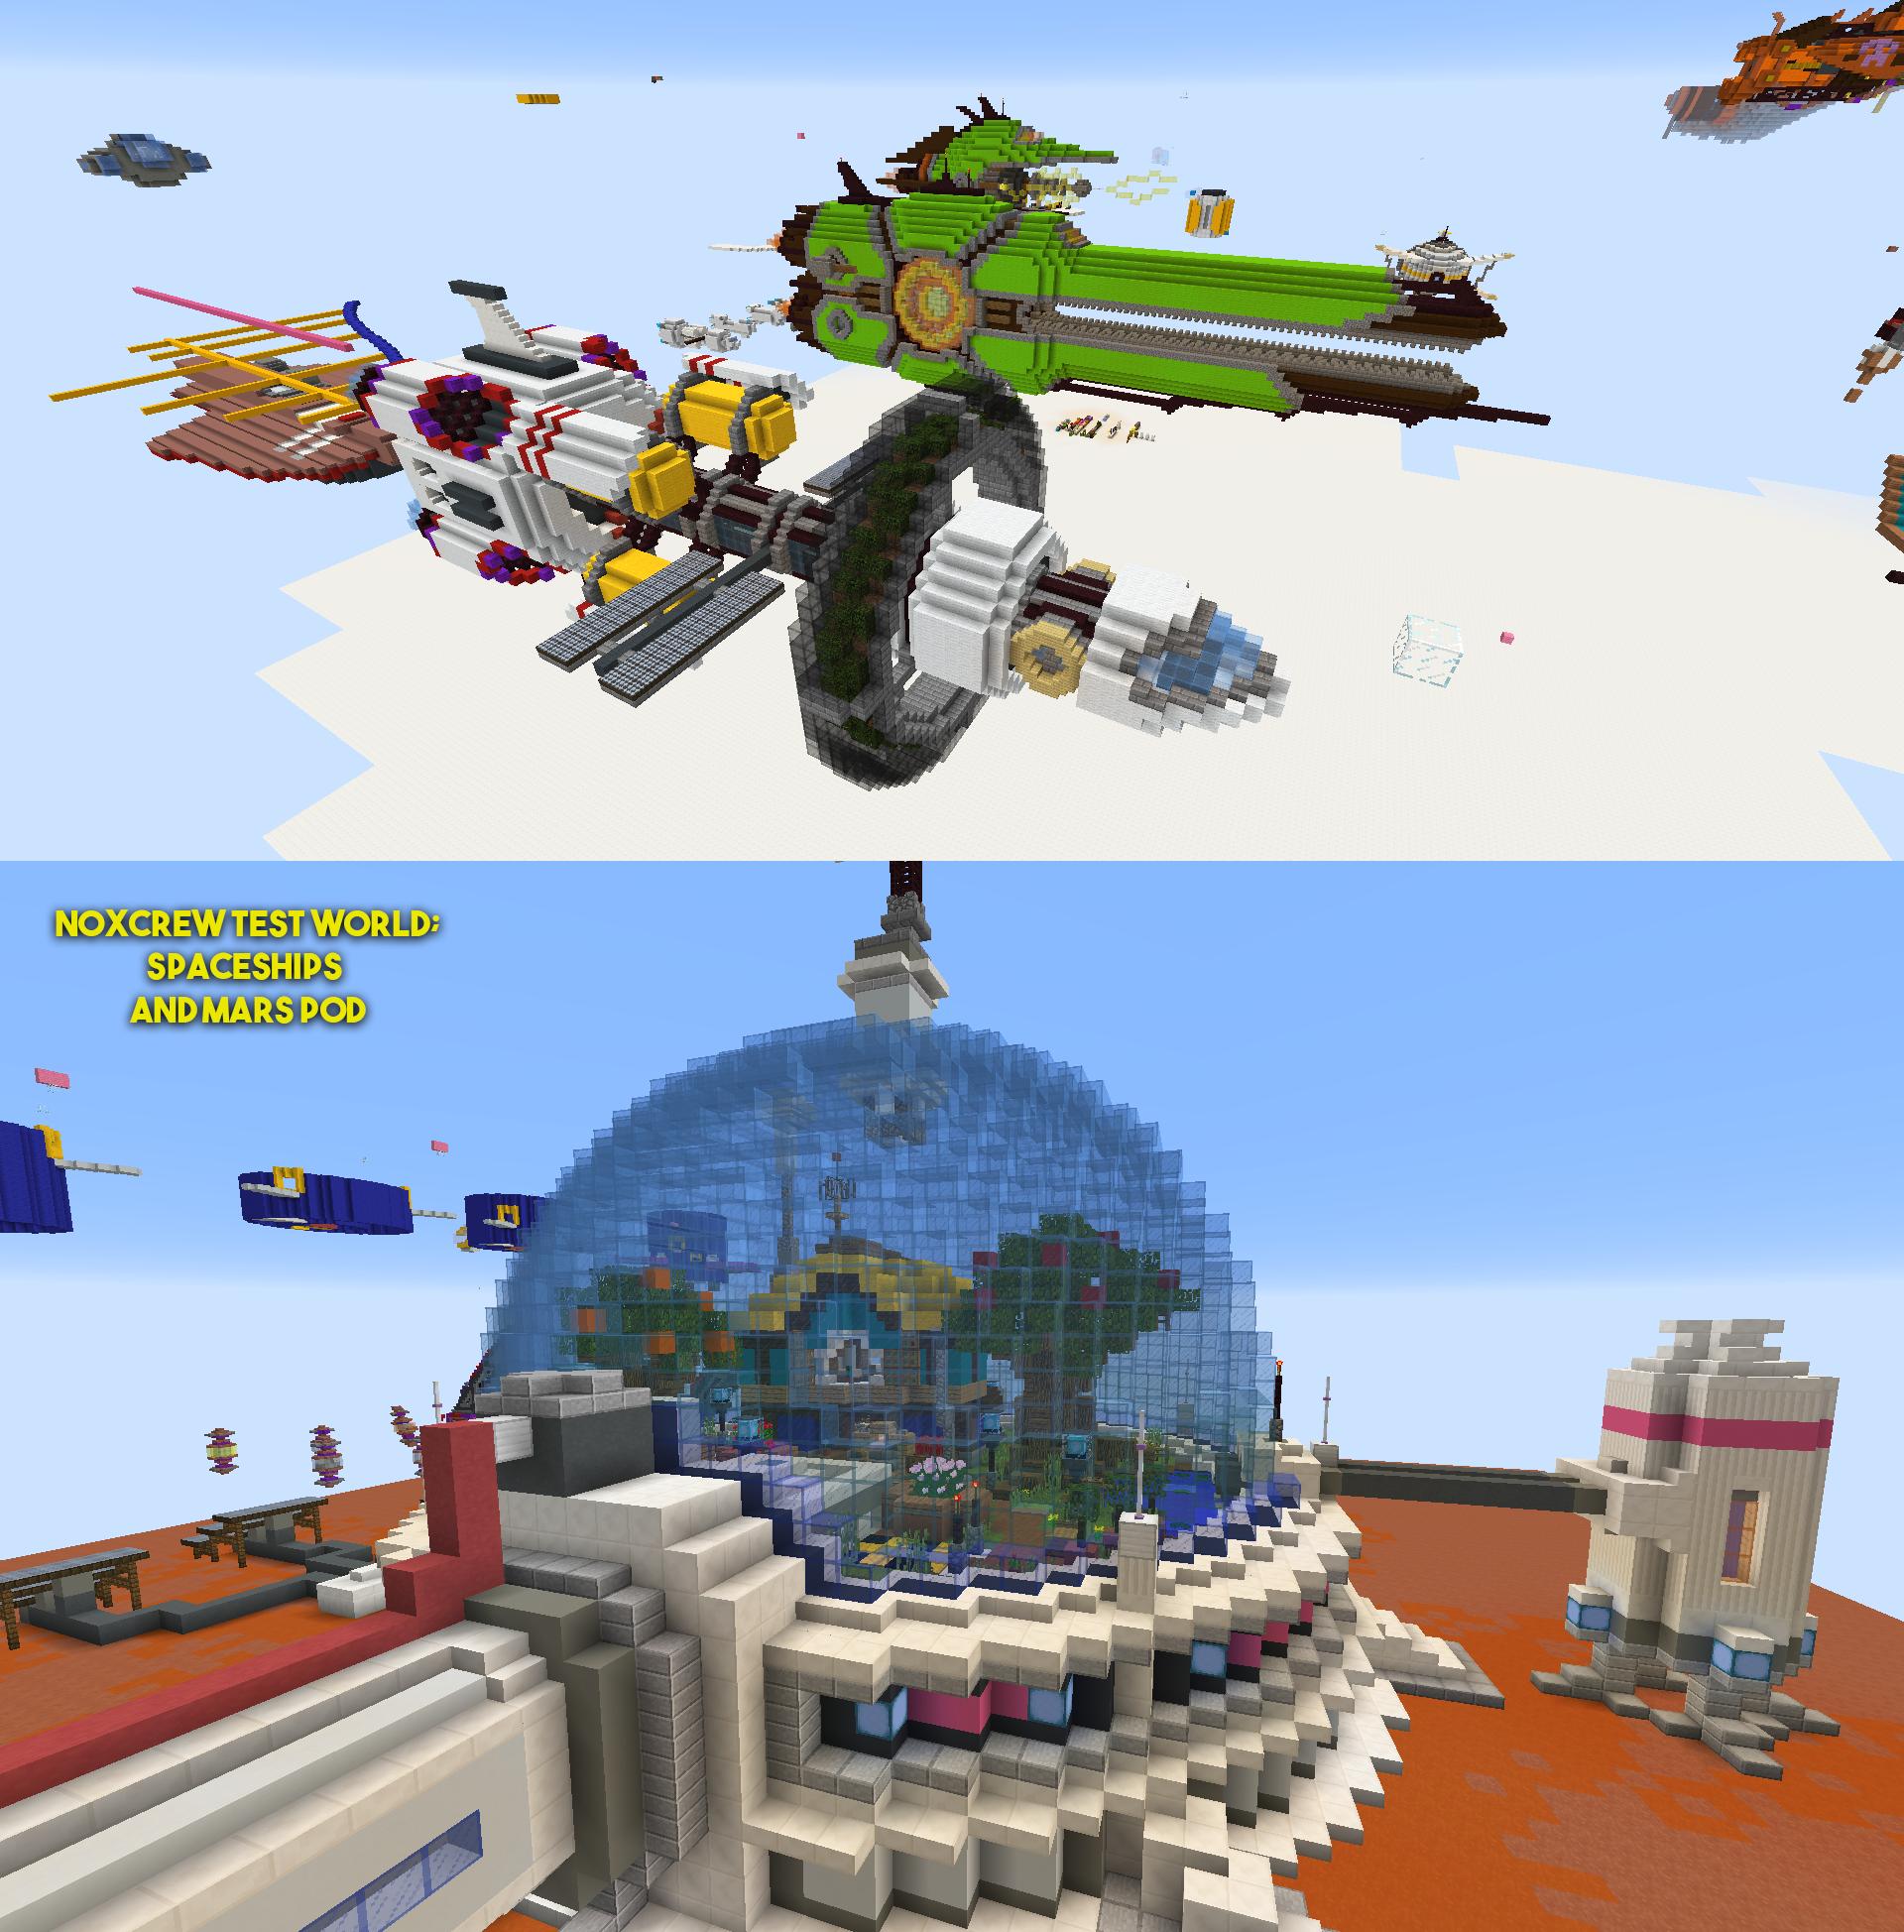 Minecraft-Noxcrew-Test-World.png